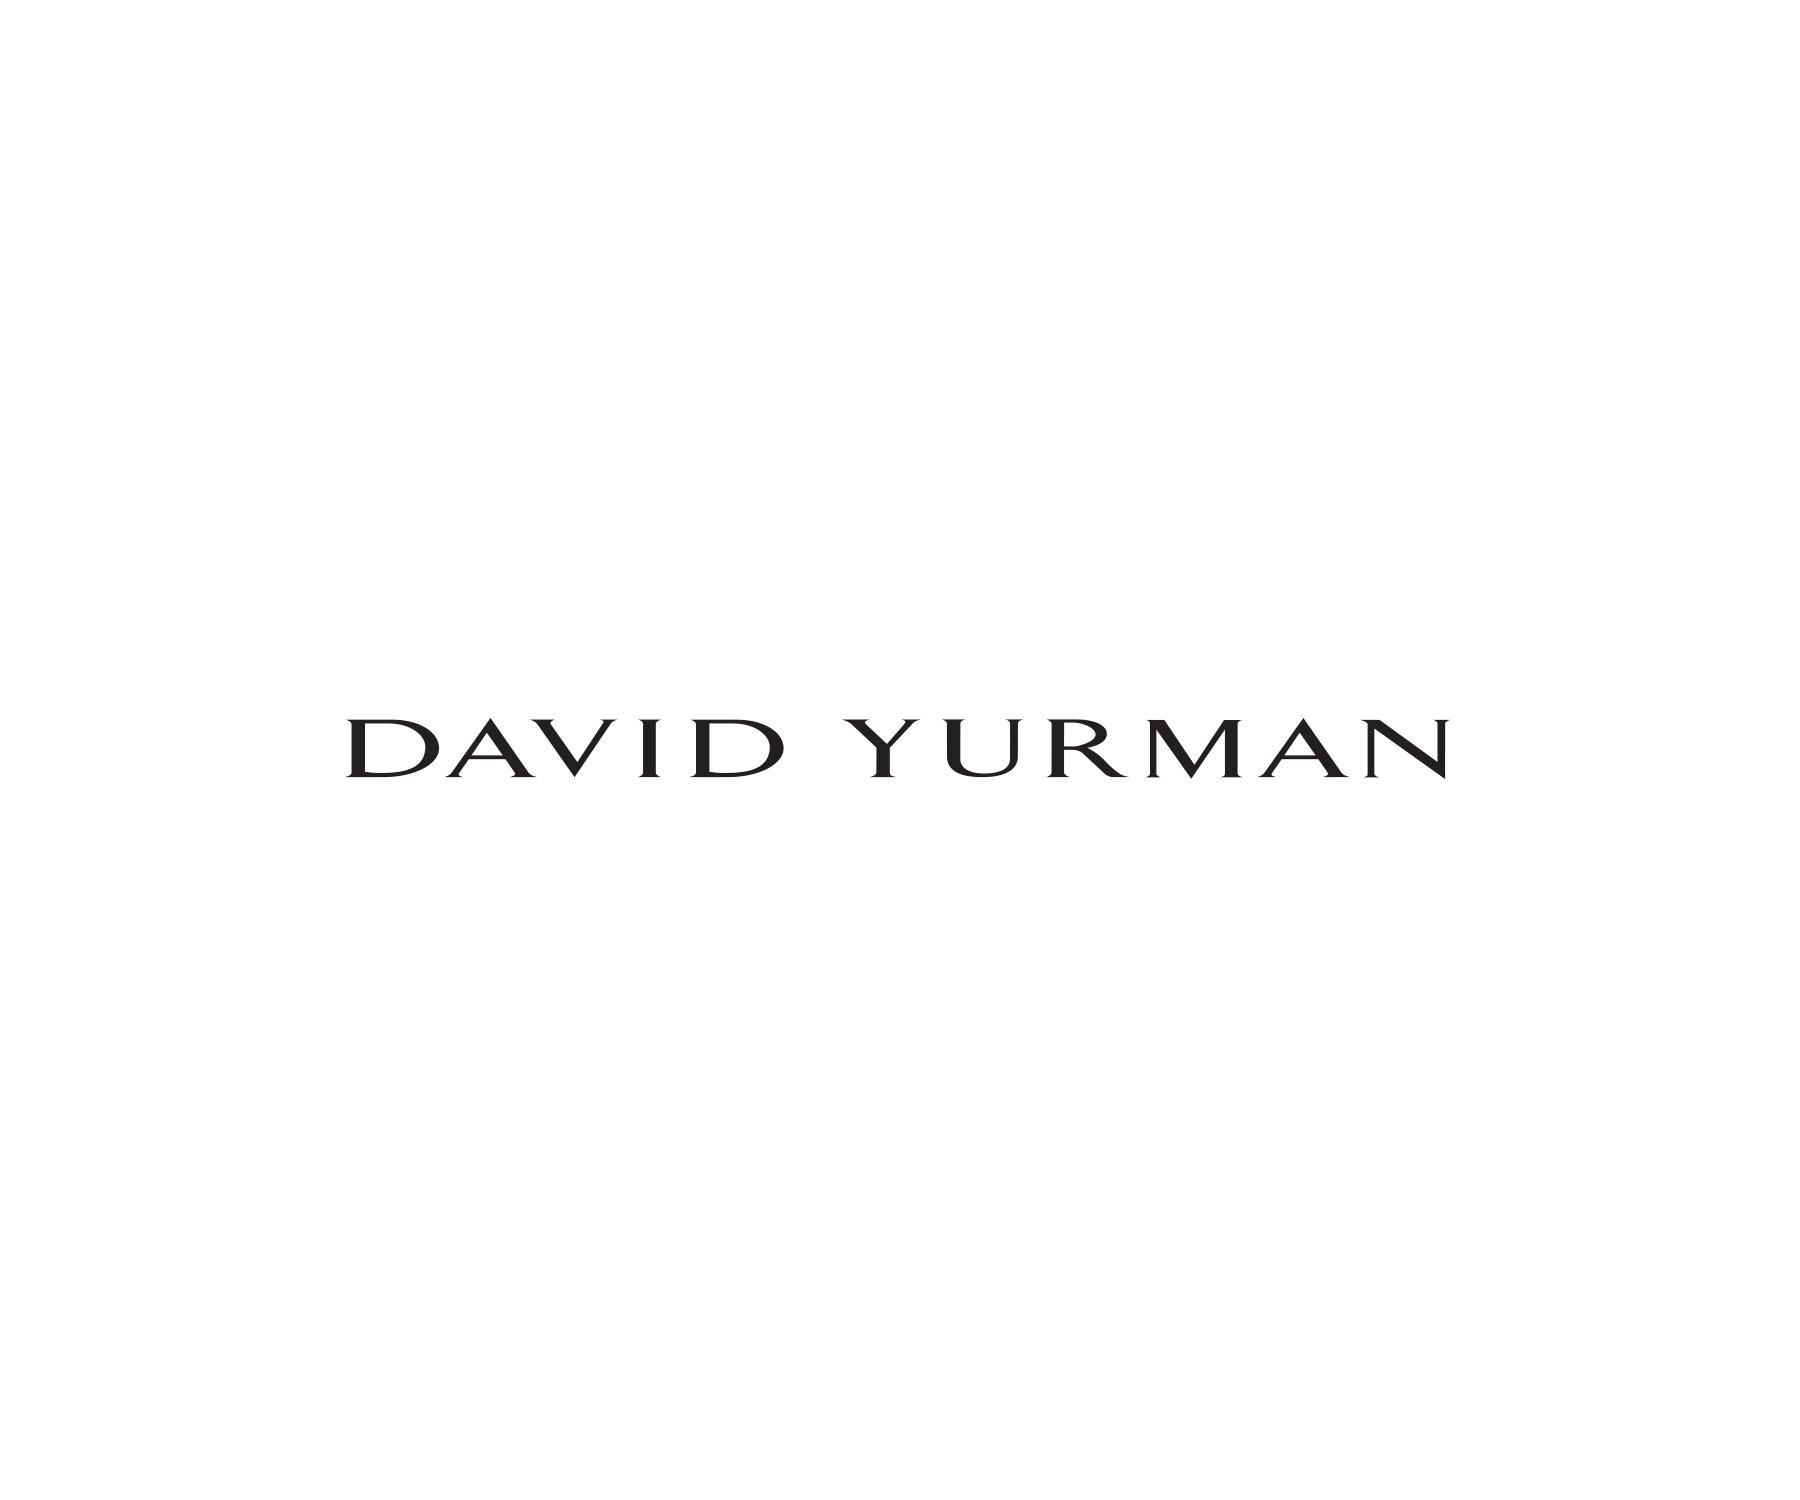 David Yurman Deco和Streamline袖扣,925纯银配黑玛瑙或彼得石材质,或18K金材质,在顶部光线照射下的带曲线纹理侧面的抛光白色石头表面。